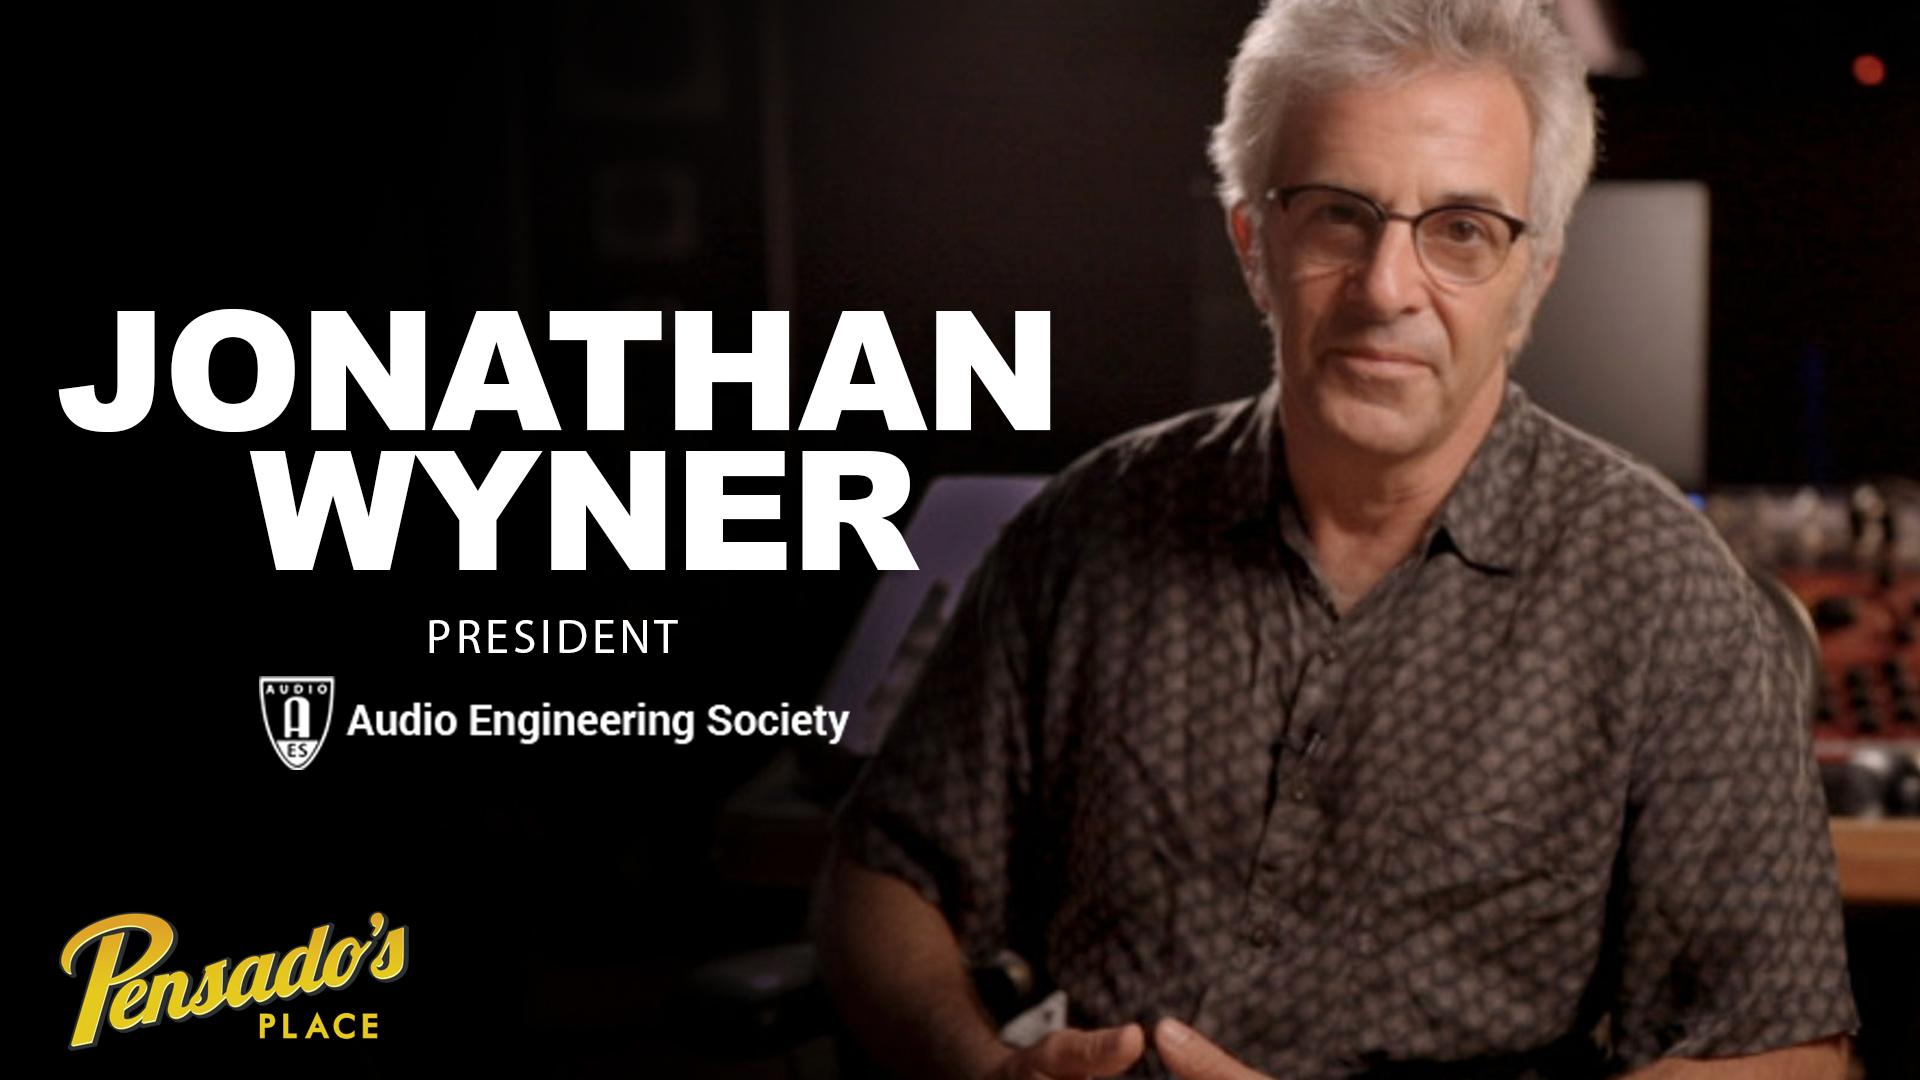 President of Audio Engineering Society, Jonathan Wyner